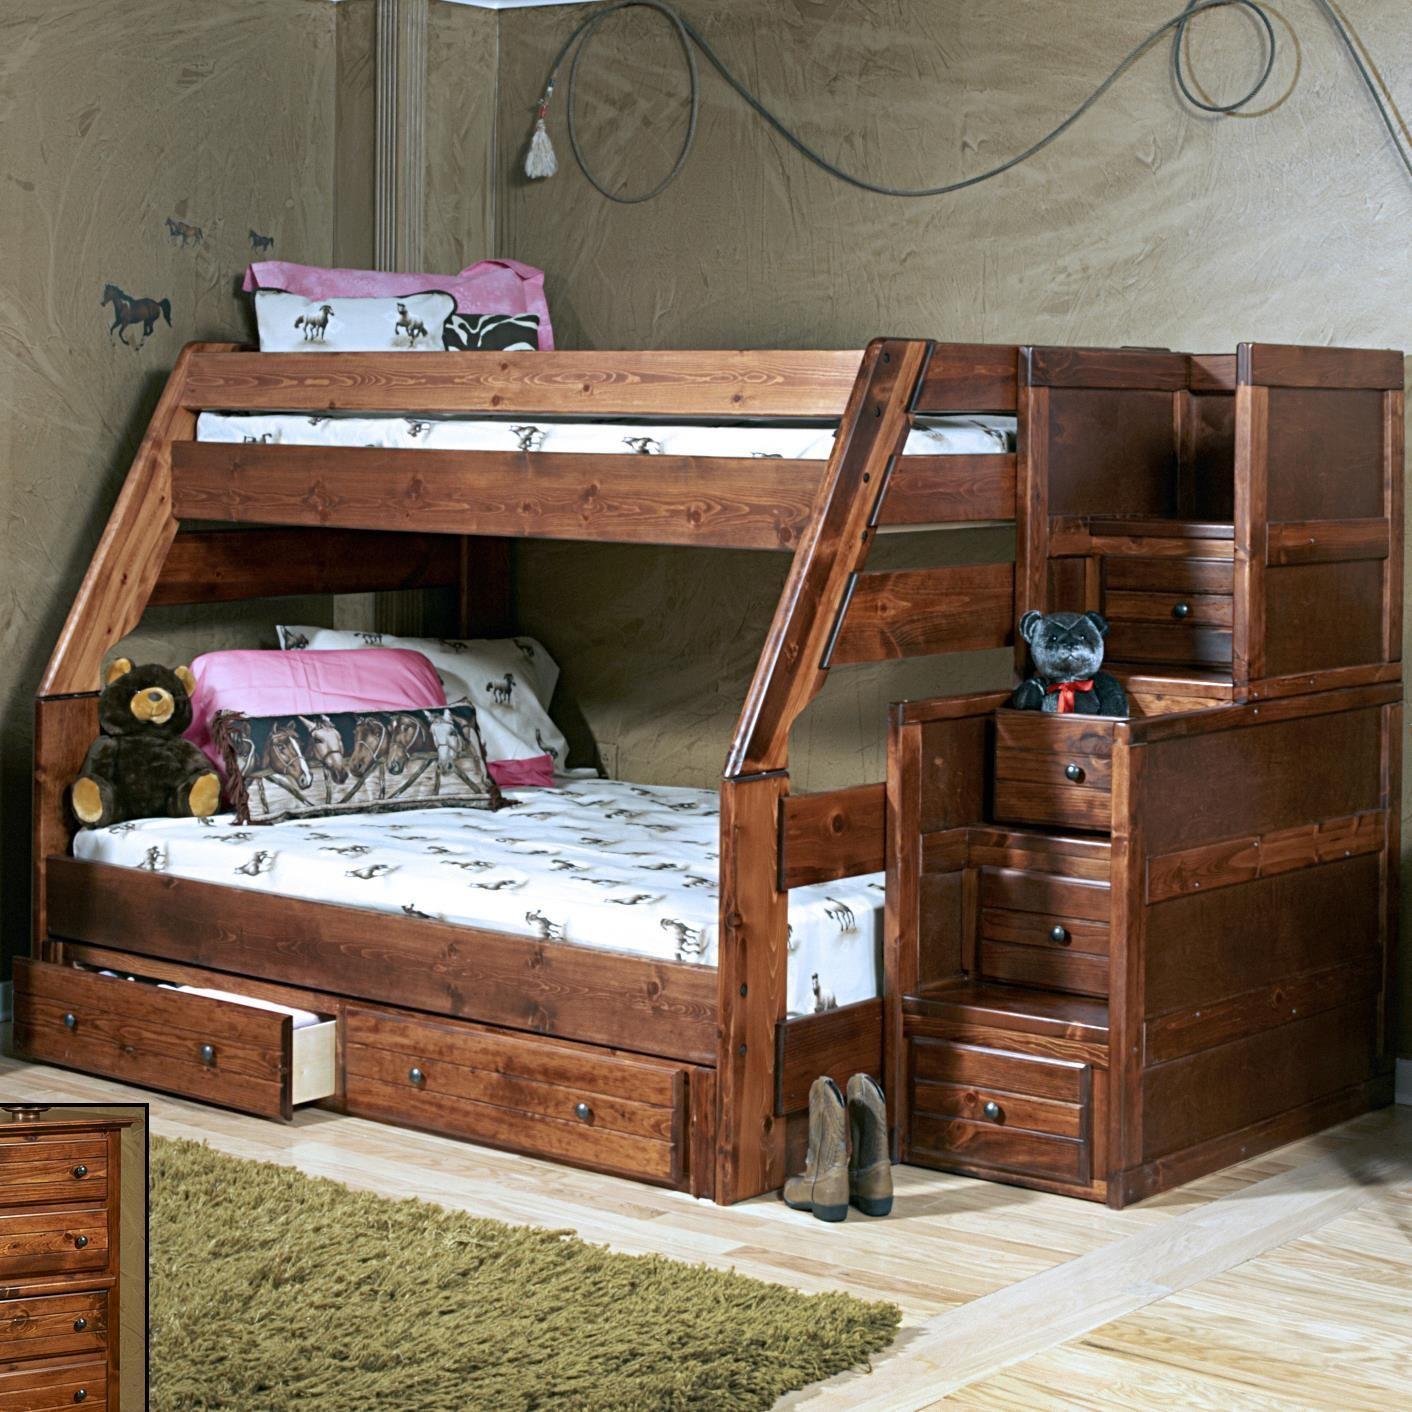 Sedona Sedona Bunk With Storage Stairs By Trendwood Bunk